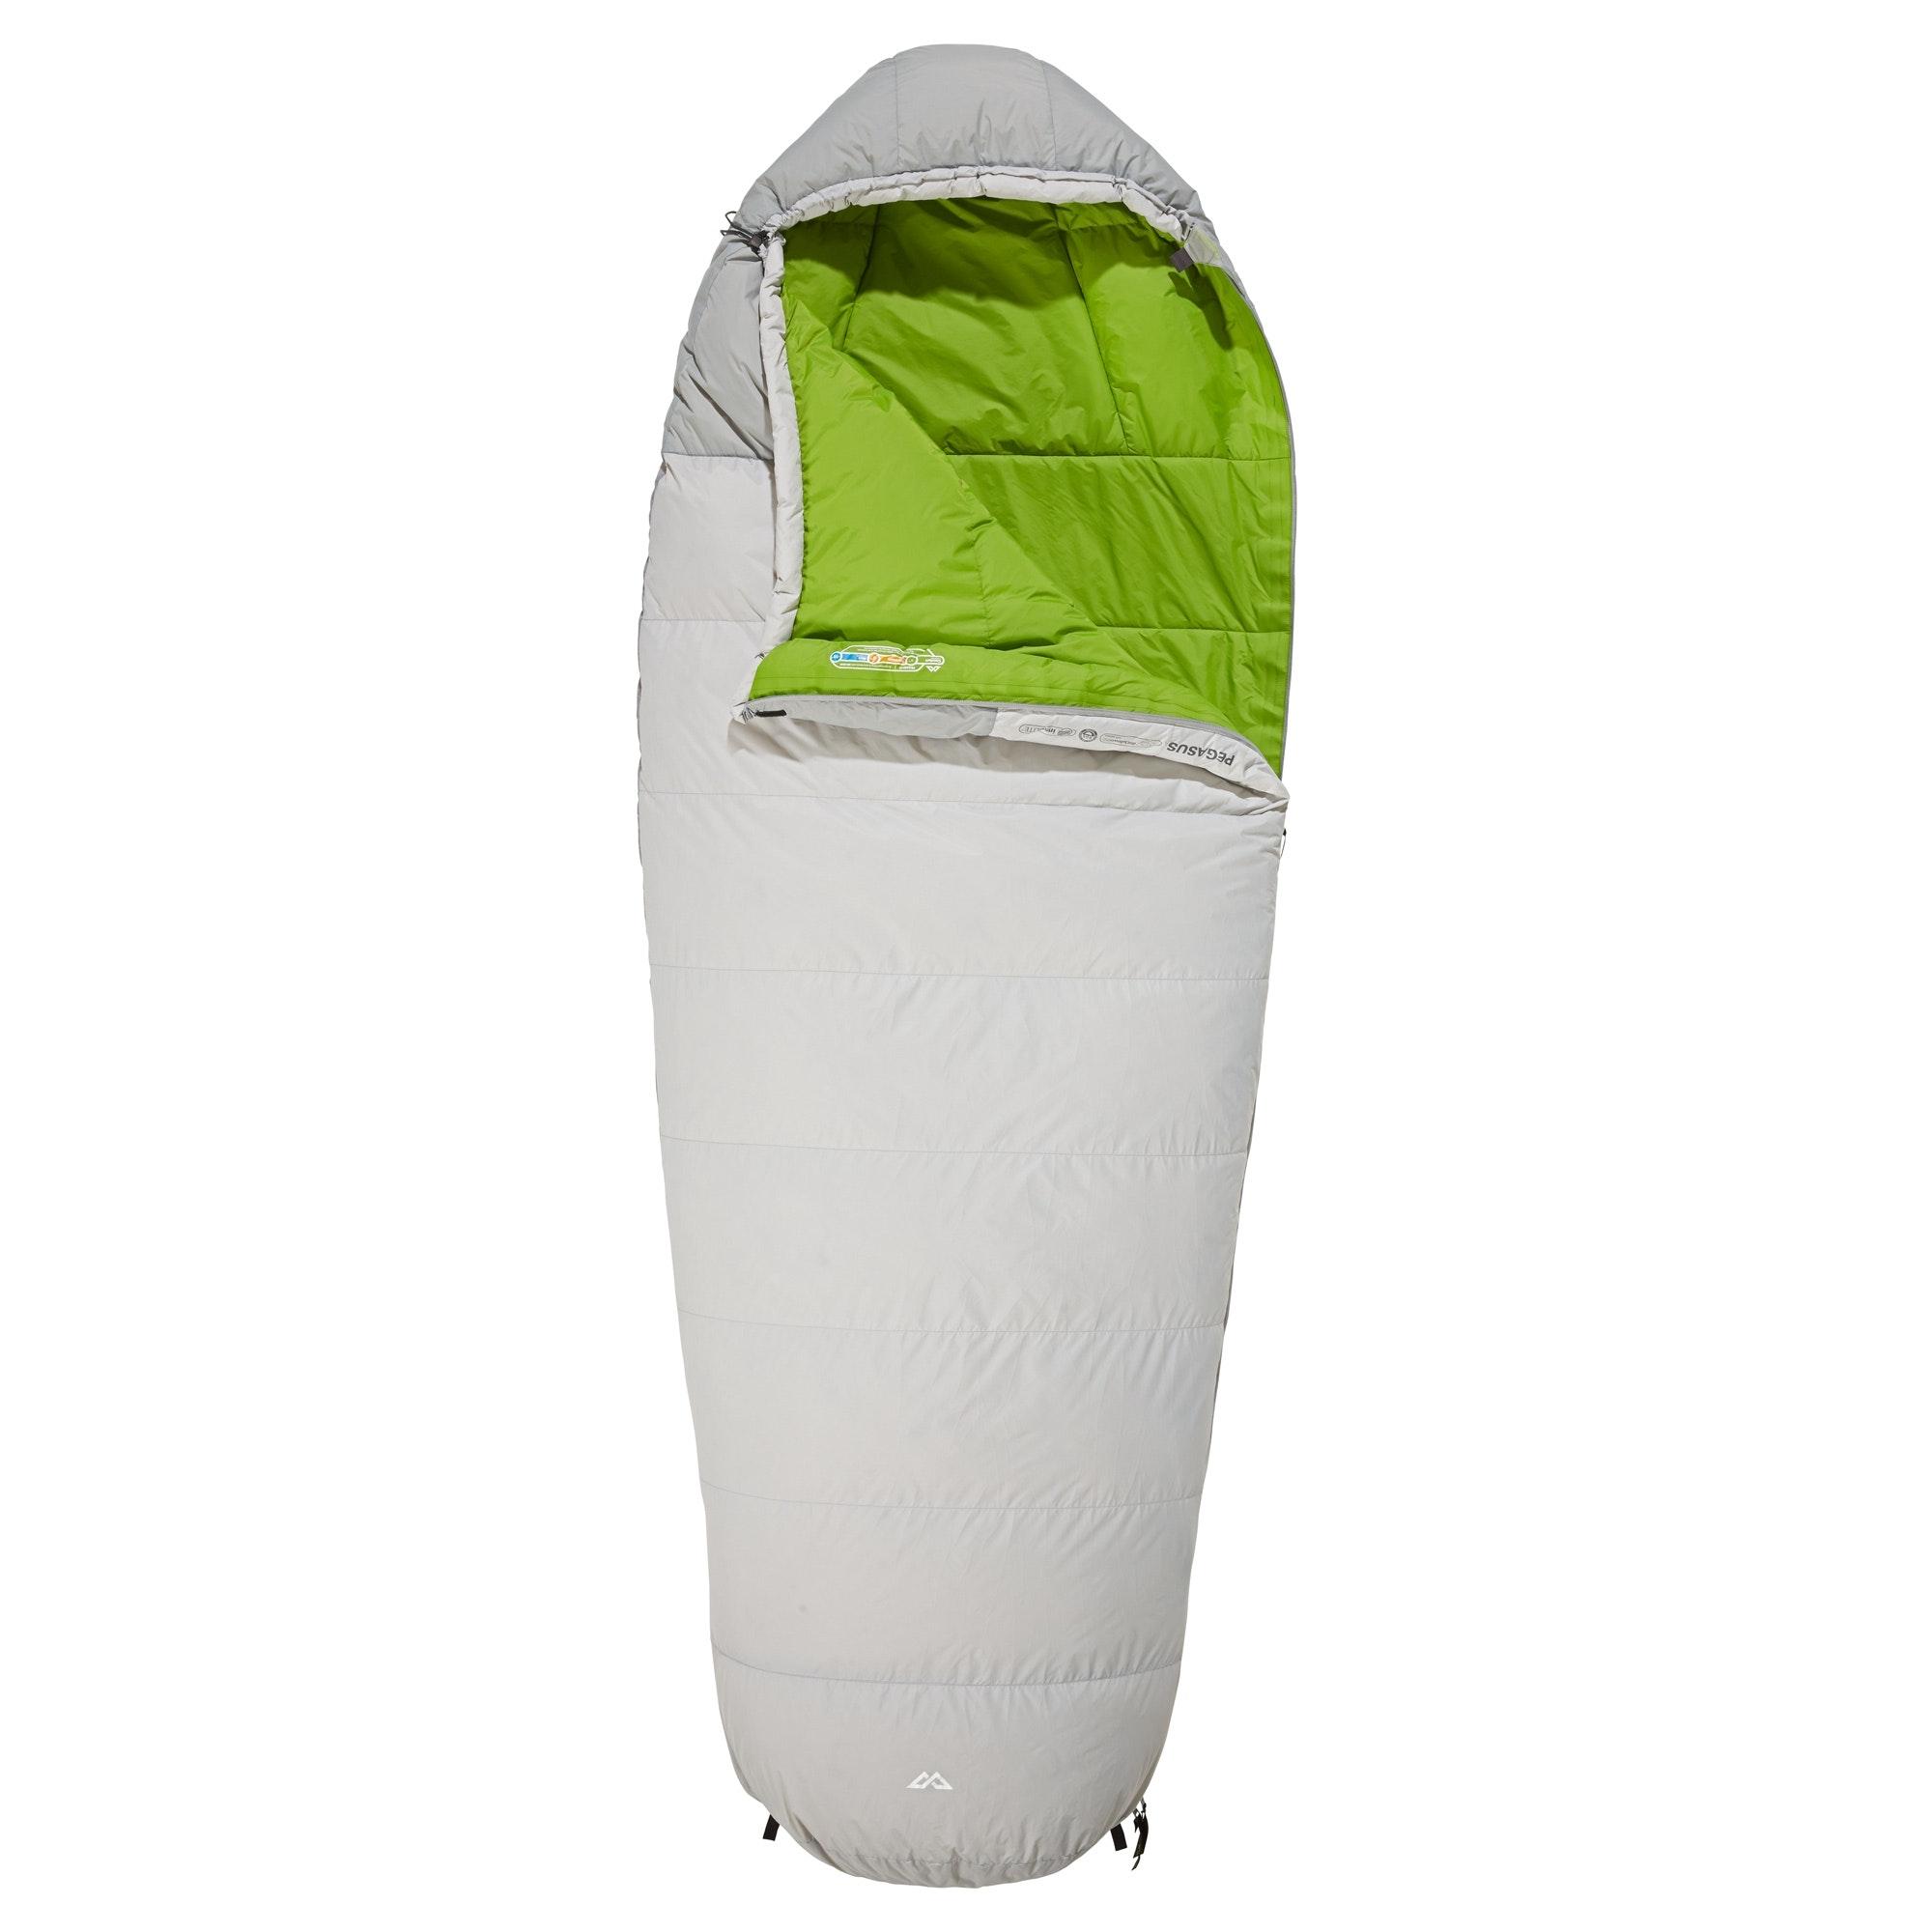 Best Lightweight Sleeping Bag For Backng Uk Ceagesp